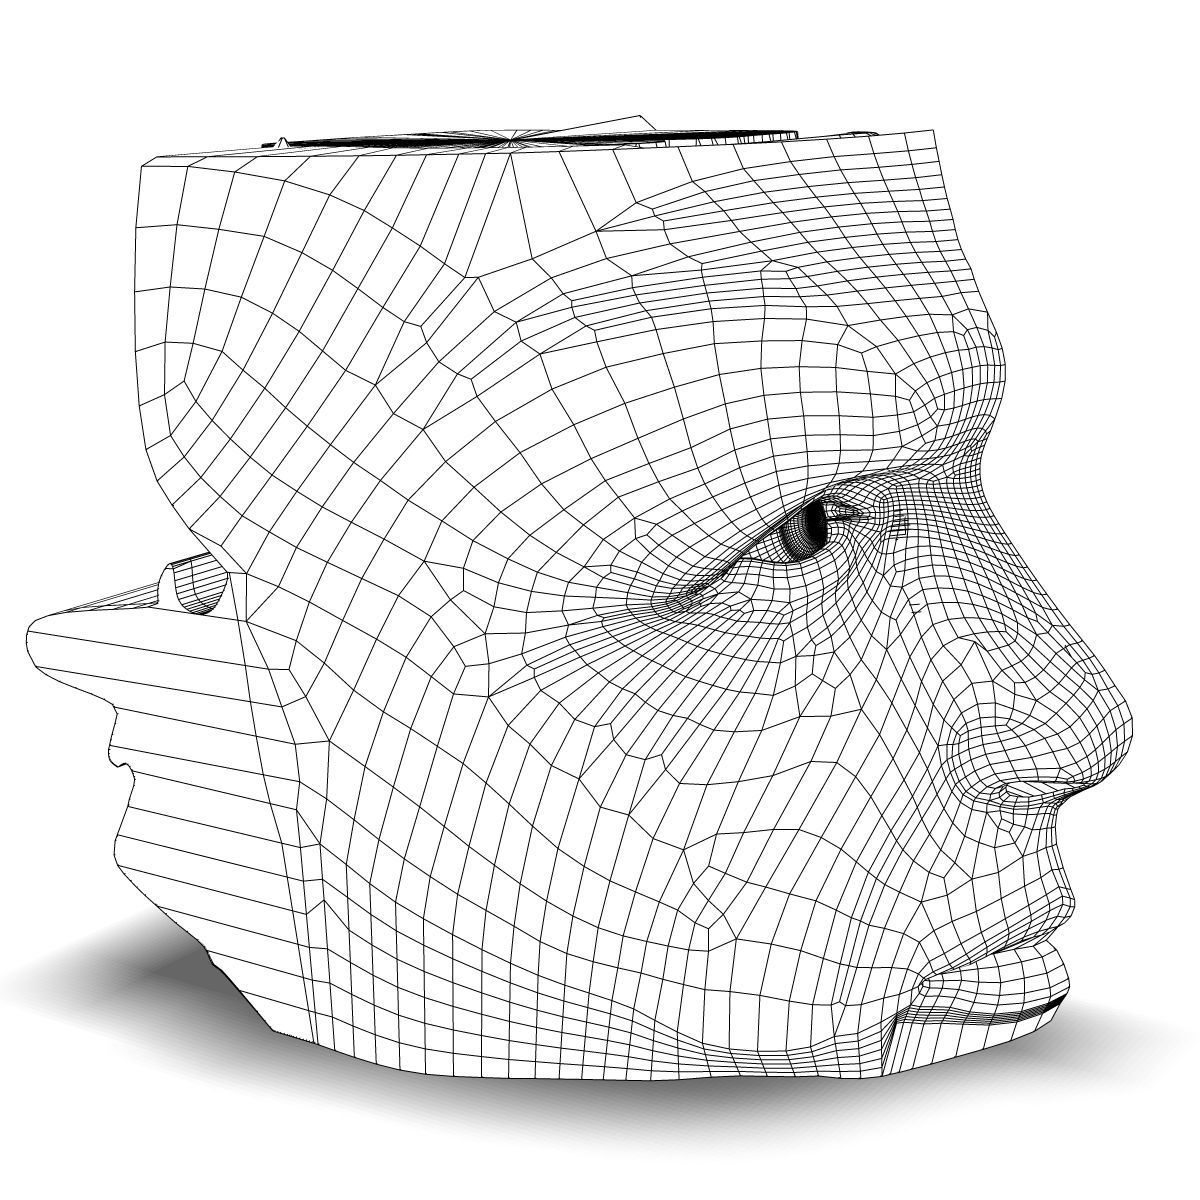 Human Nose Anatomy 3d Model Max Obj 3ds Fbx C4d Lwo Lw Lws